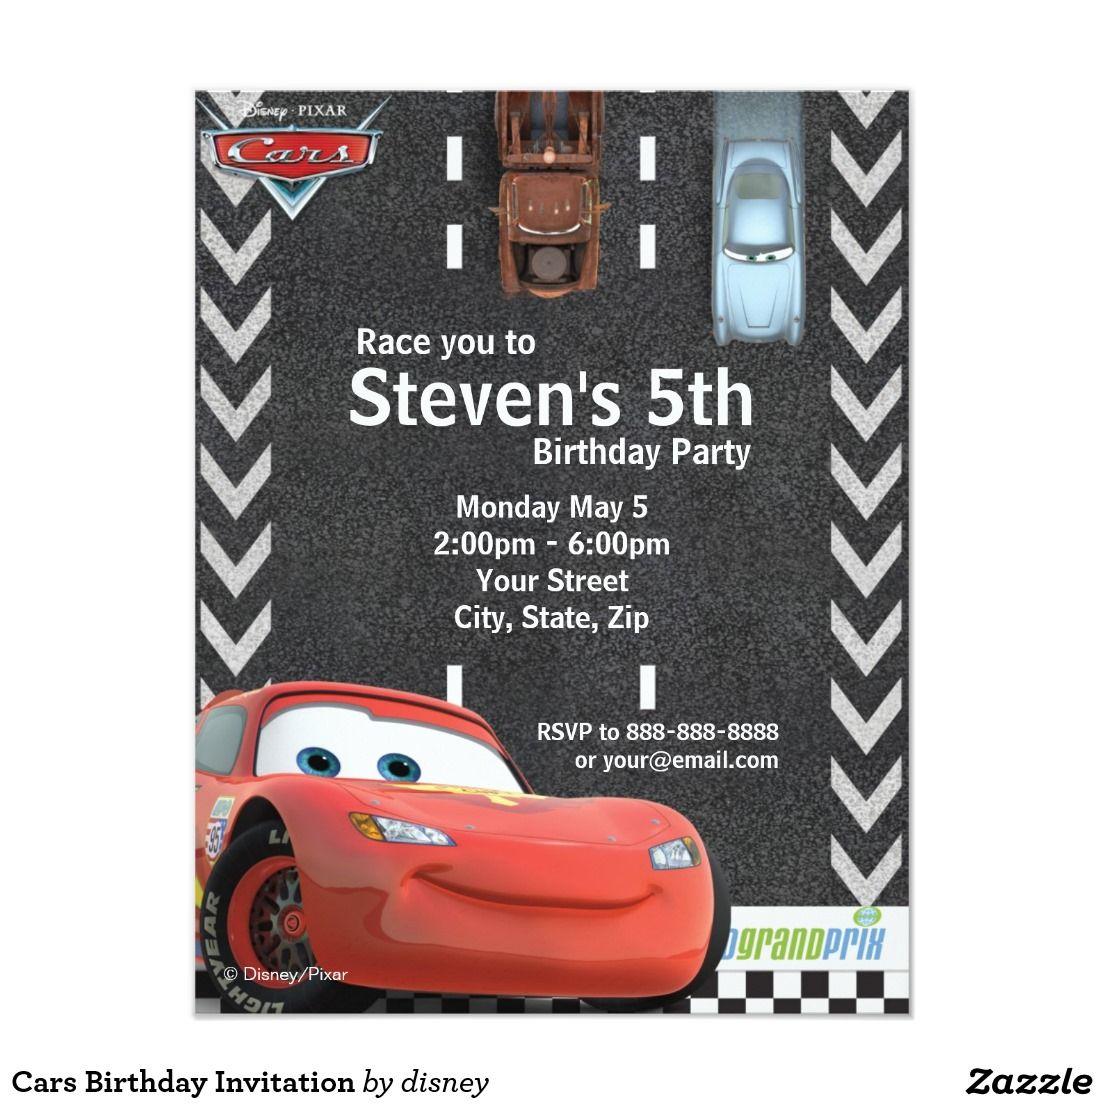 Cars Birthday Invitation   Shop the hundreds of birthday and party ...